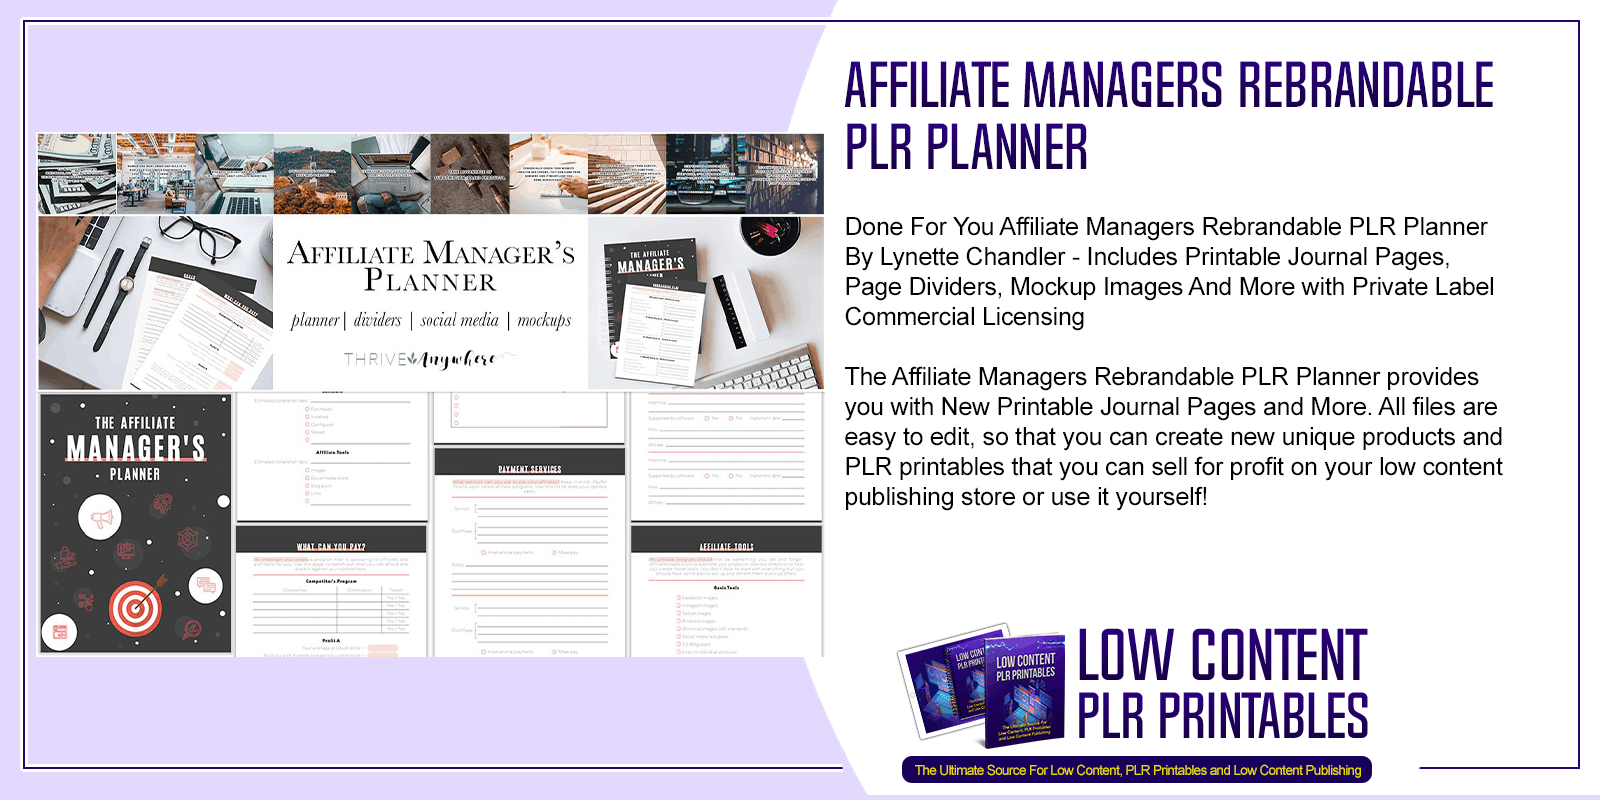 Affiliate Managers Rebrandable PLR Planner